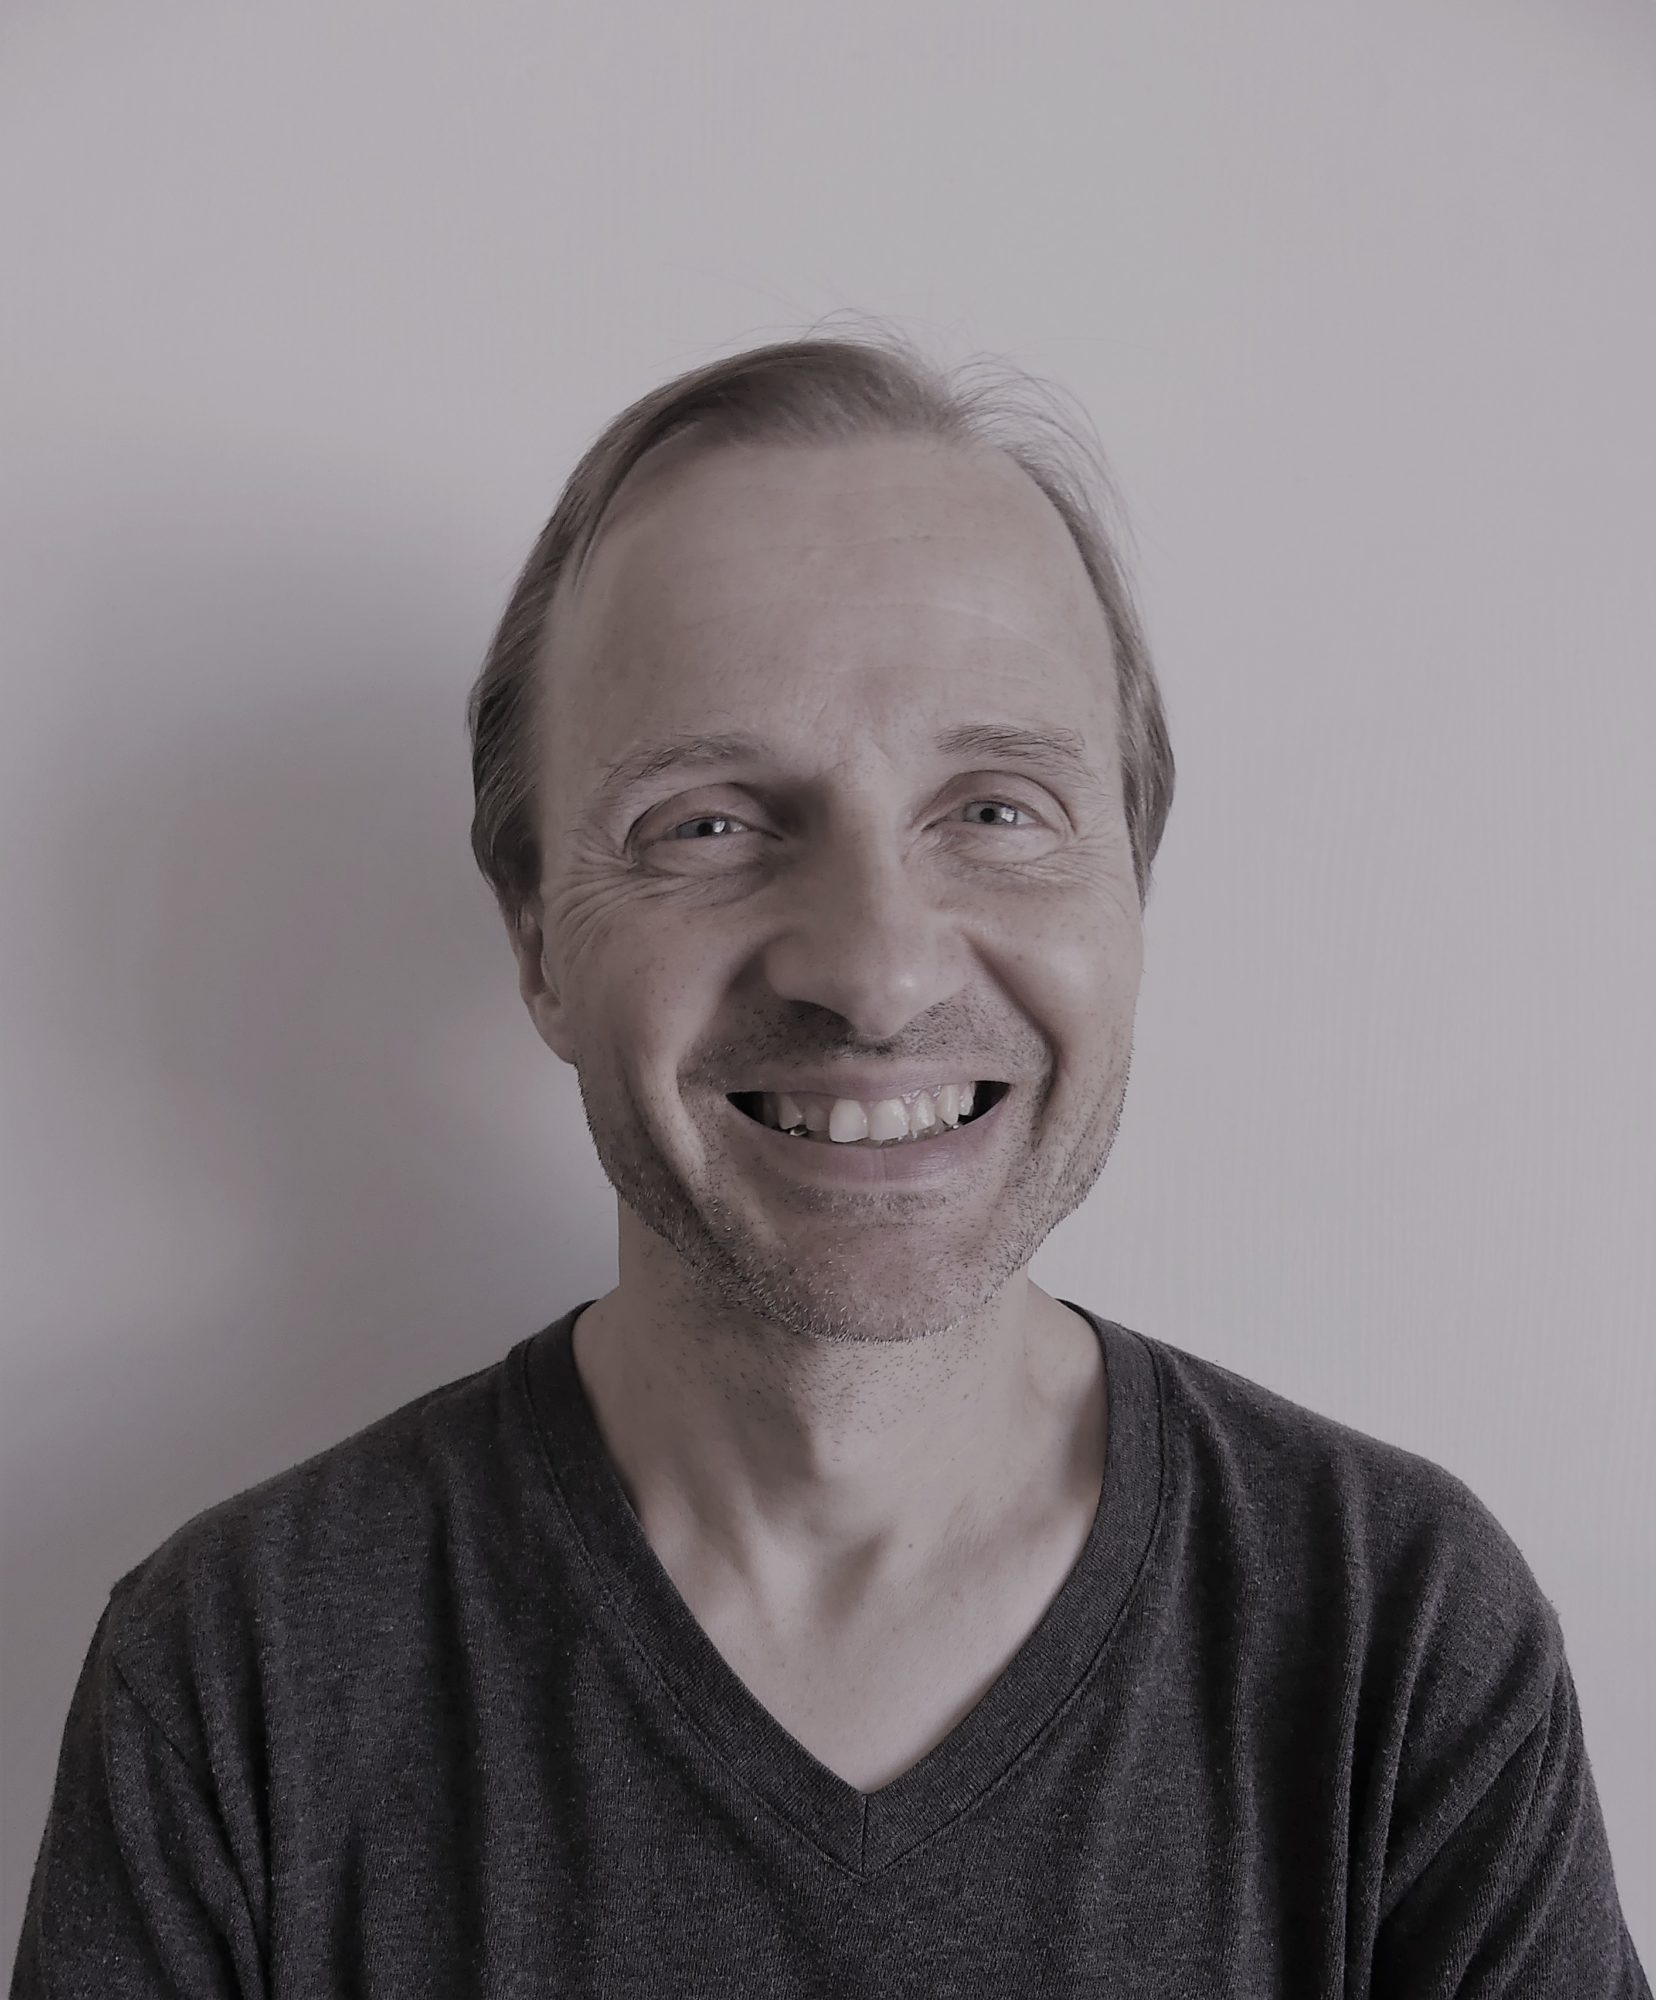 Joël Soubranne